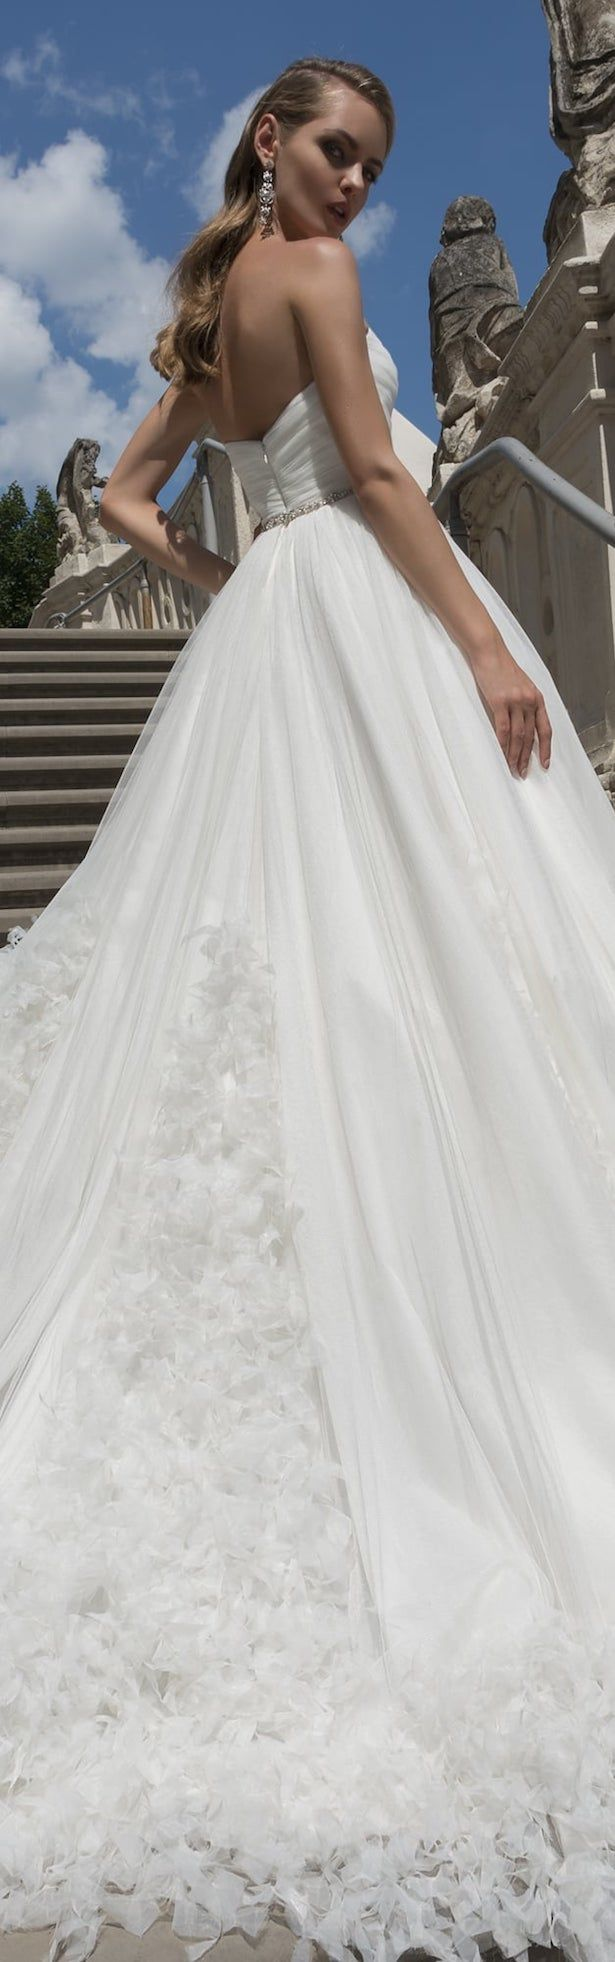 Dominiss Wedding Dresses 2017 | Pinterest | Brautkleider